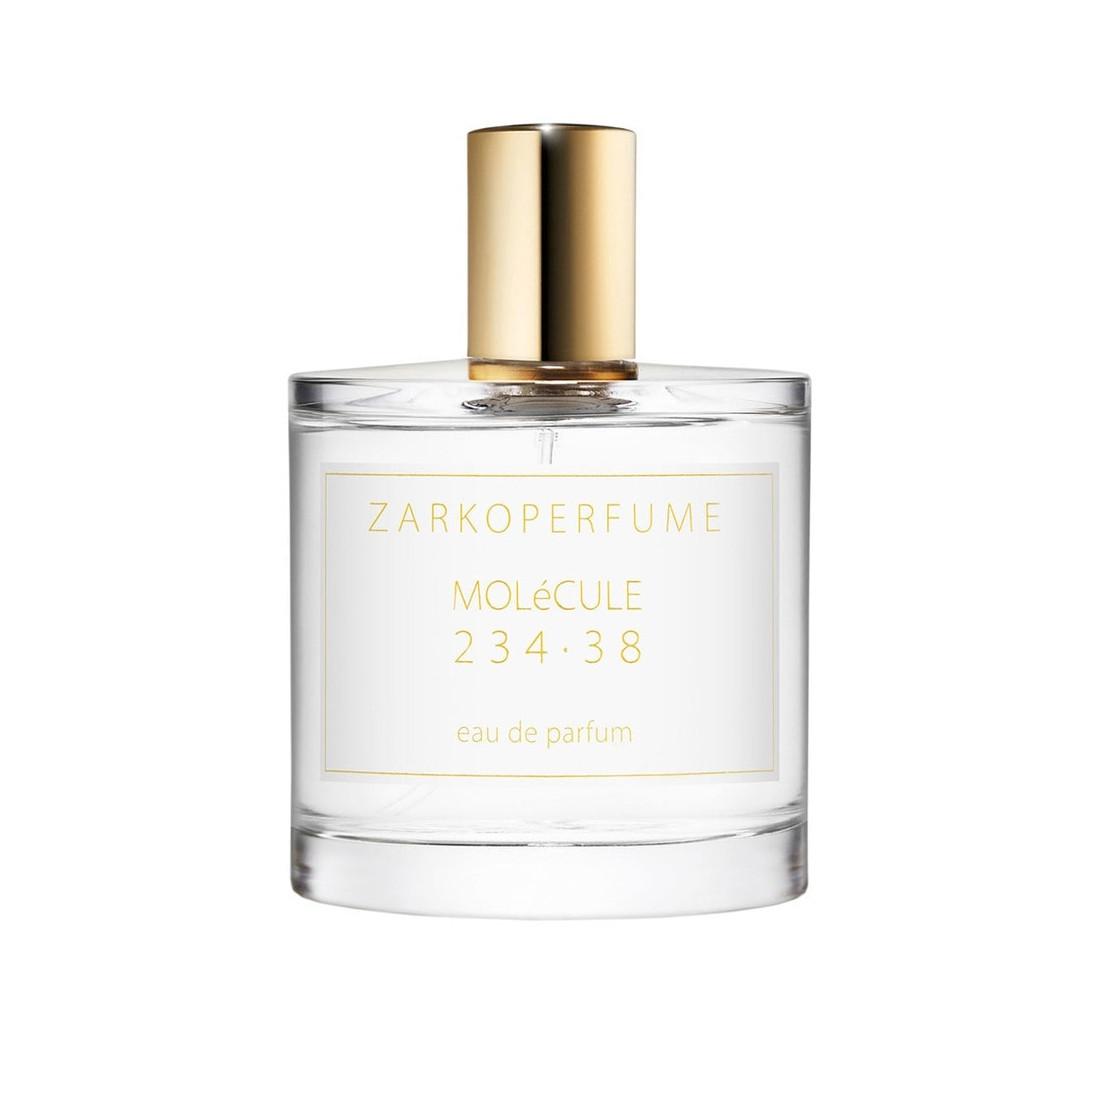 Zarko Molecule 234.38 Eau De Parfum Spray 100 ml